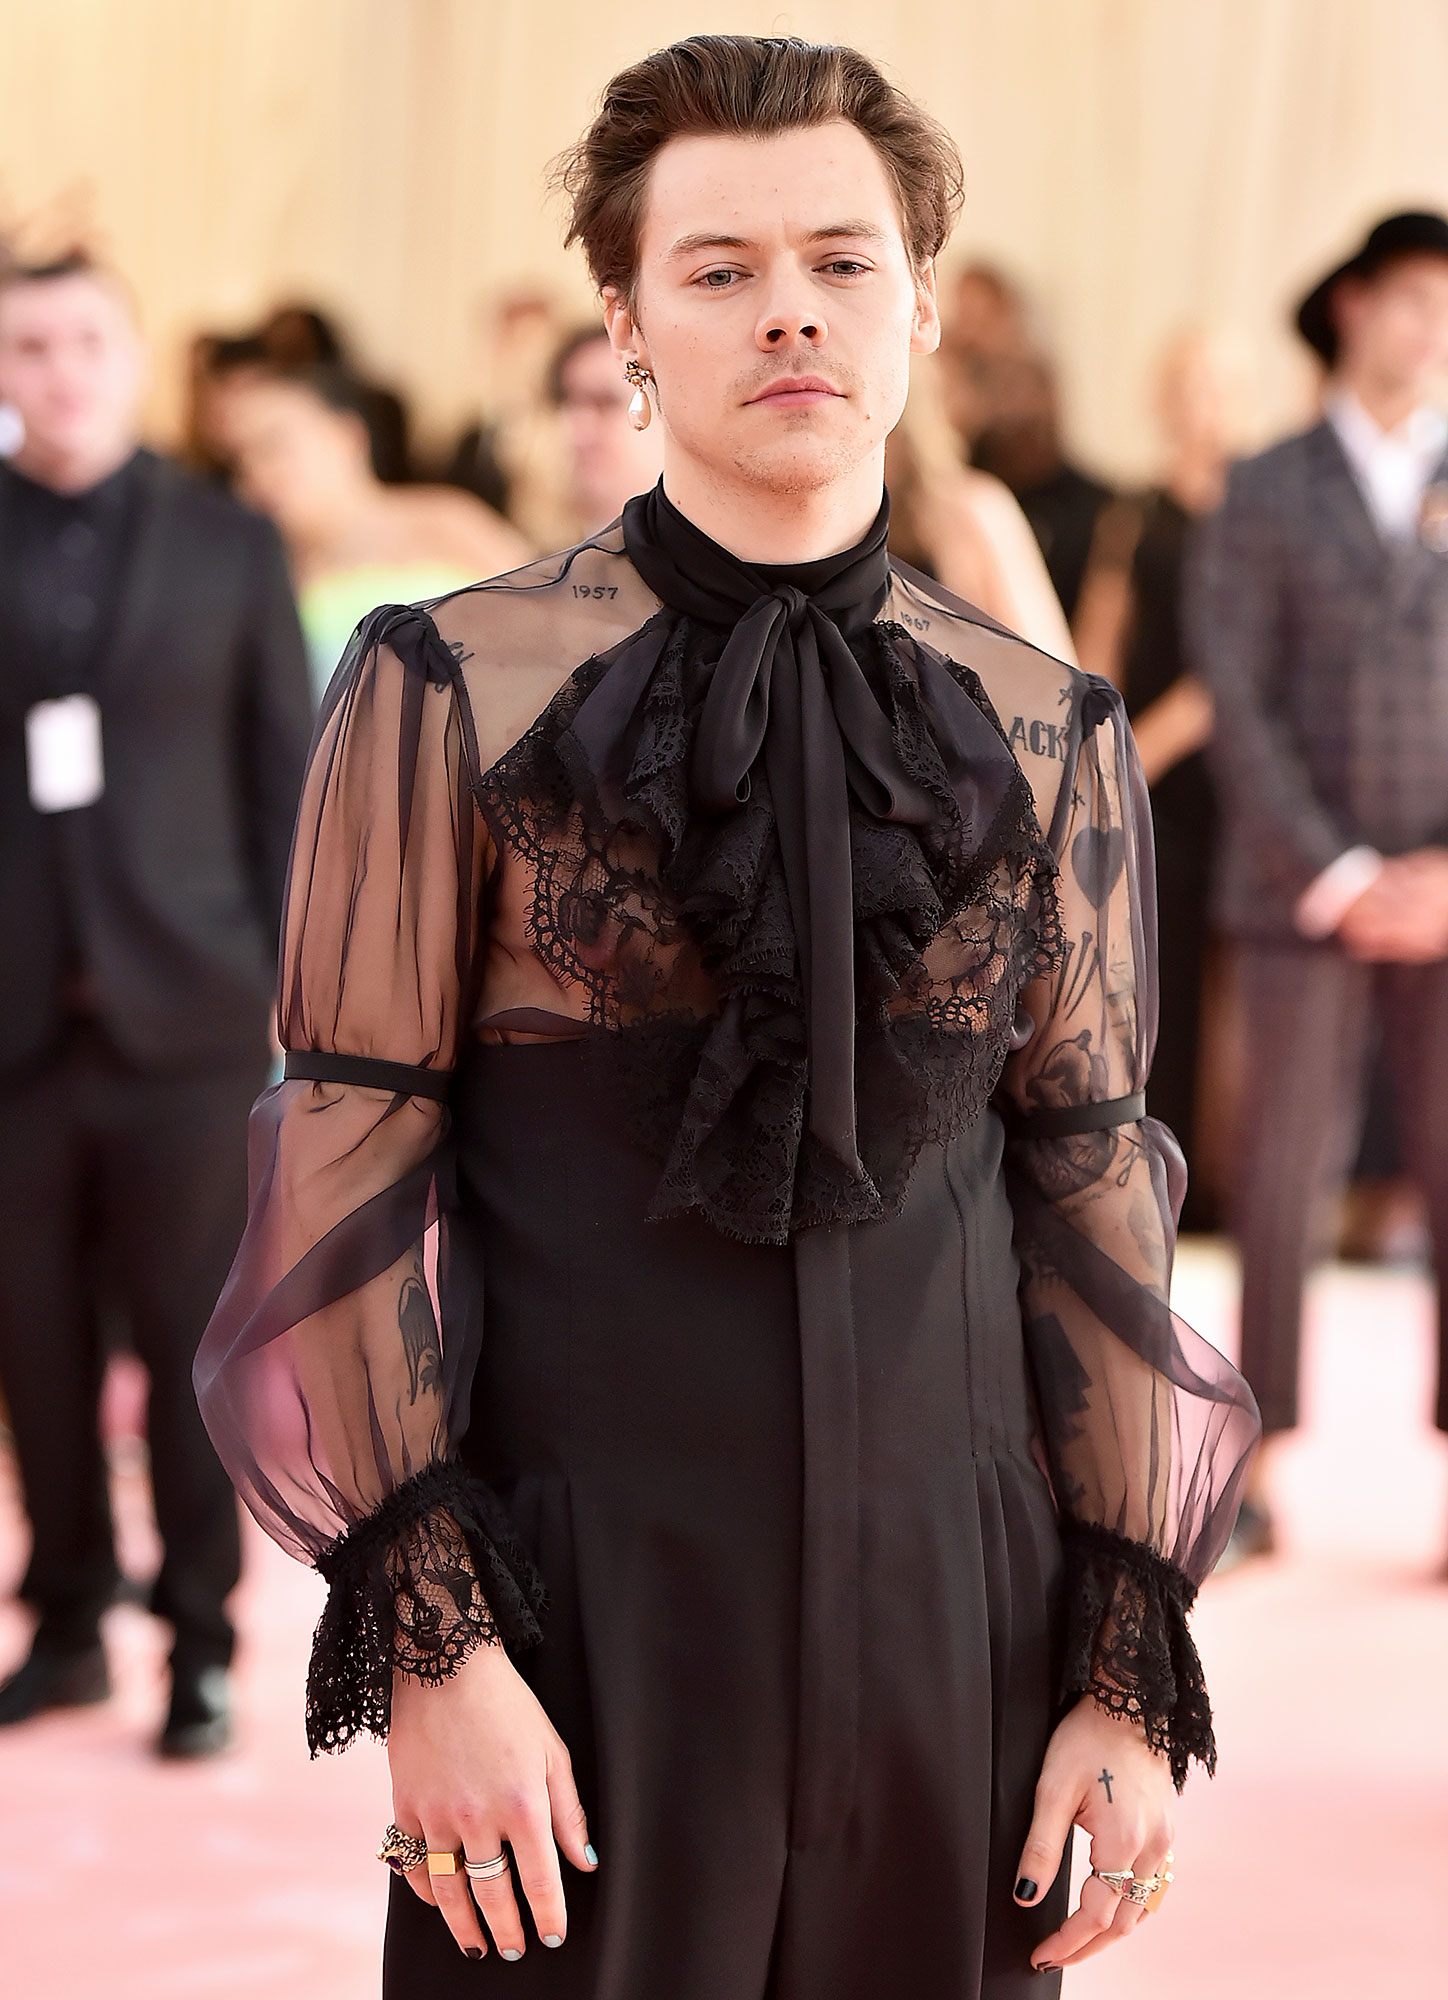 Met Gala 2019: Harry Styles Wears Sheer Gucci Blouse